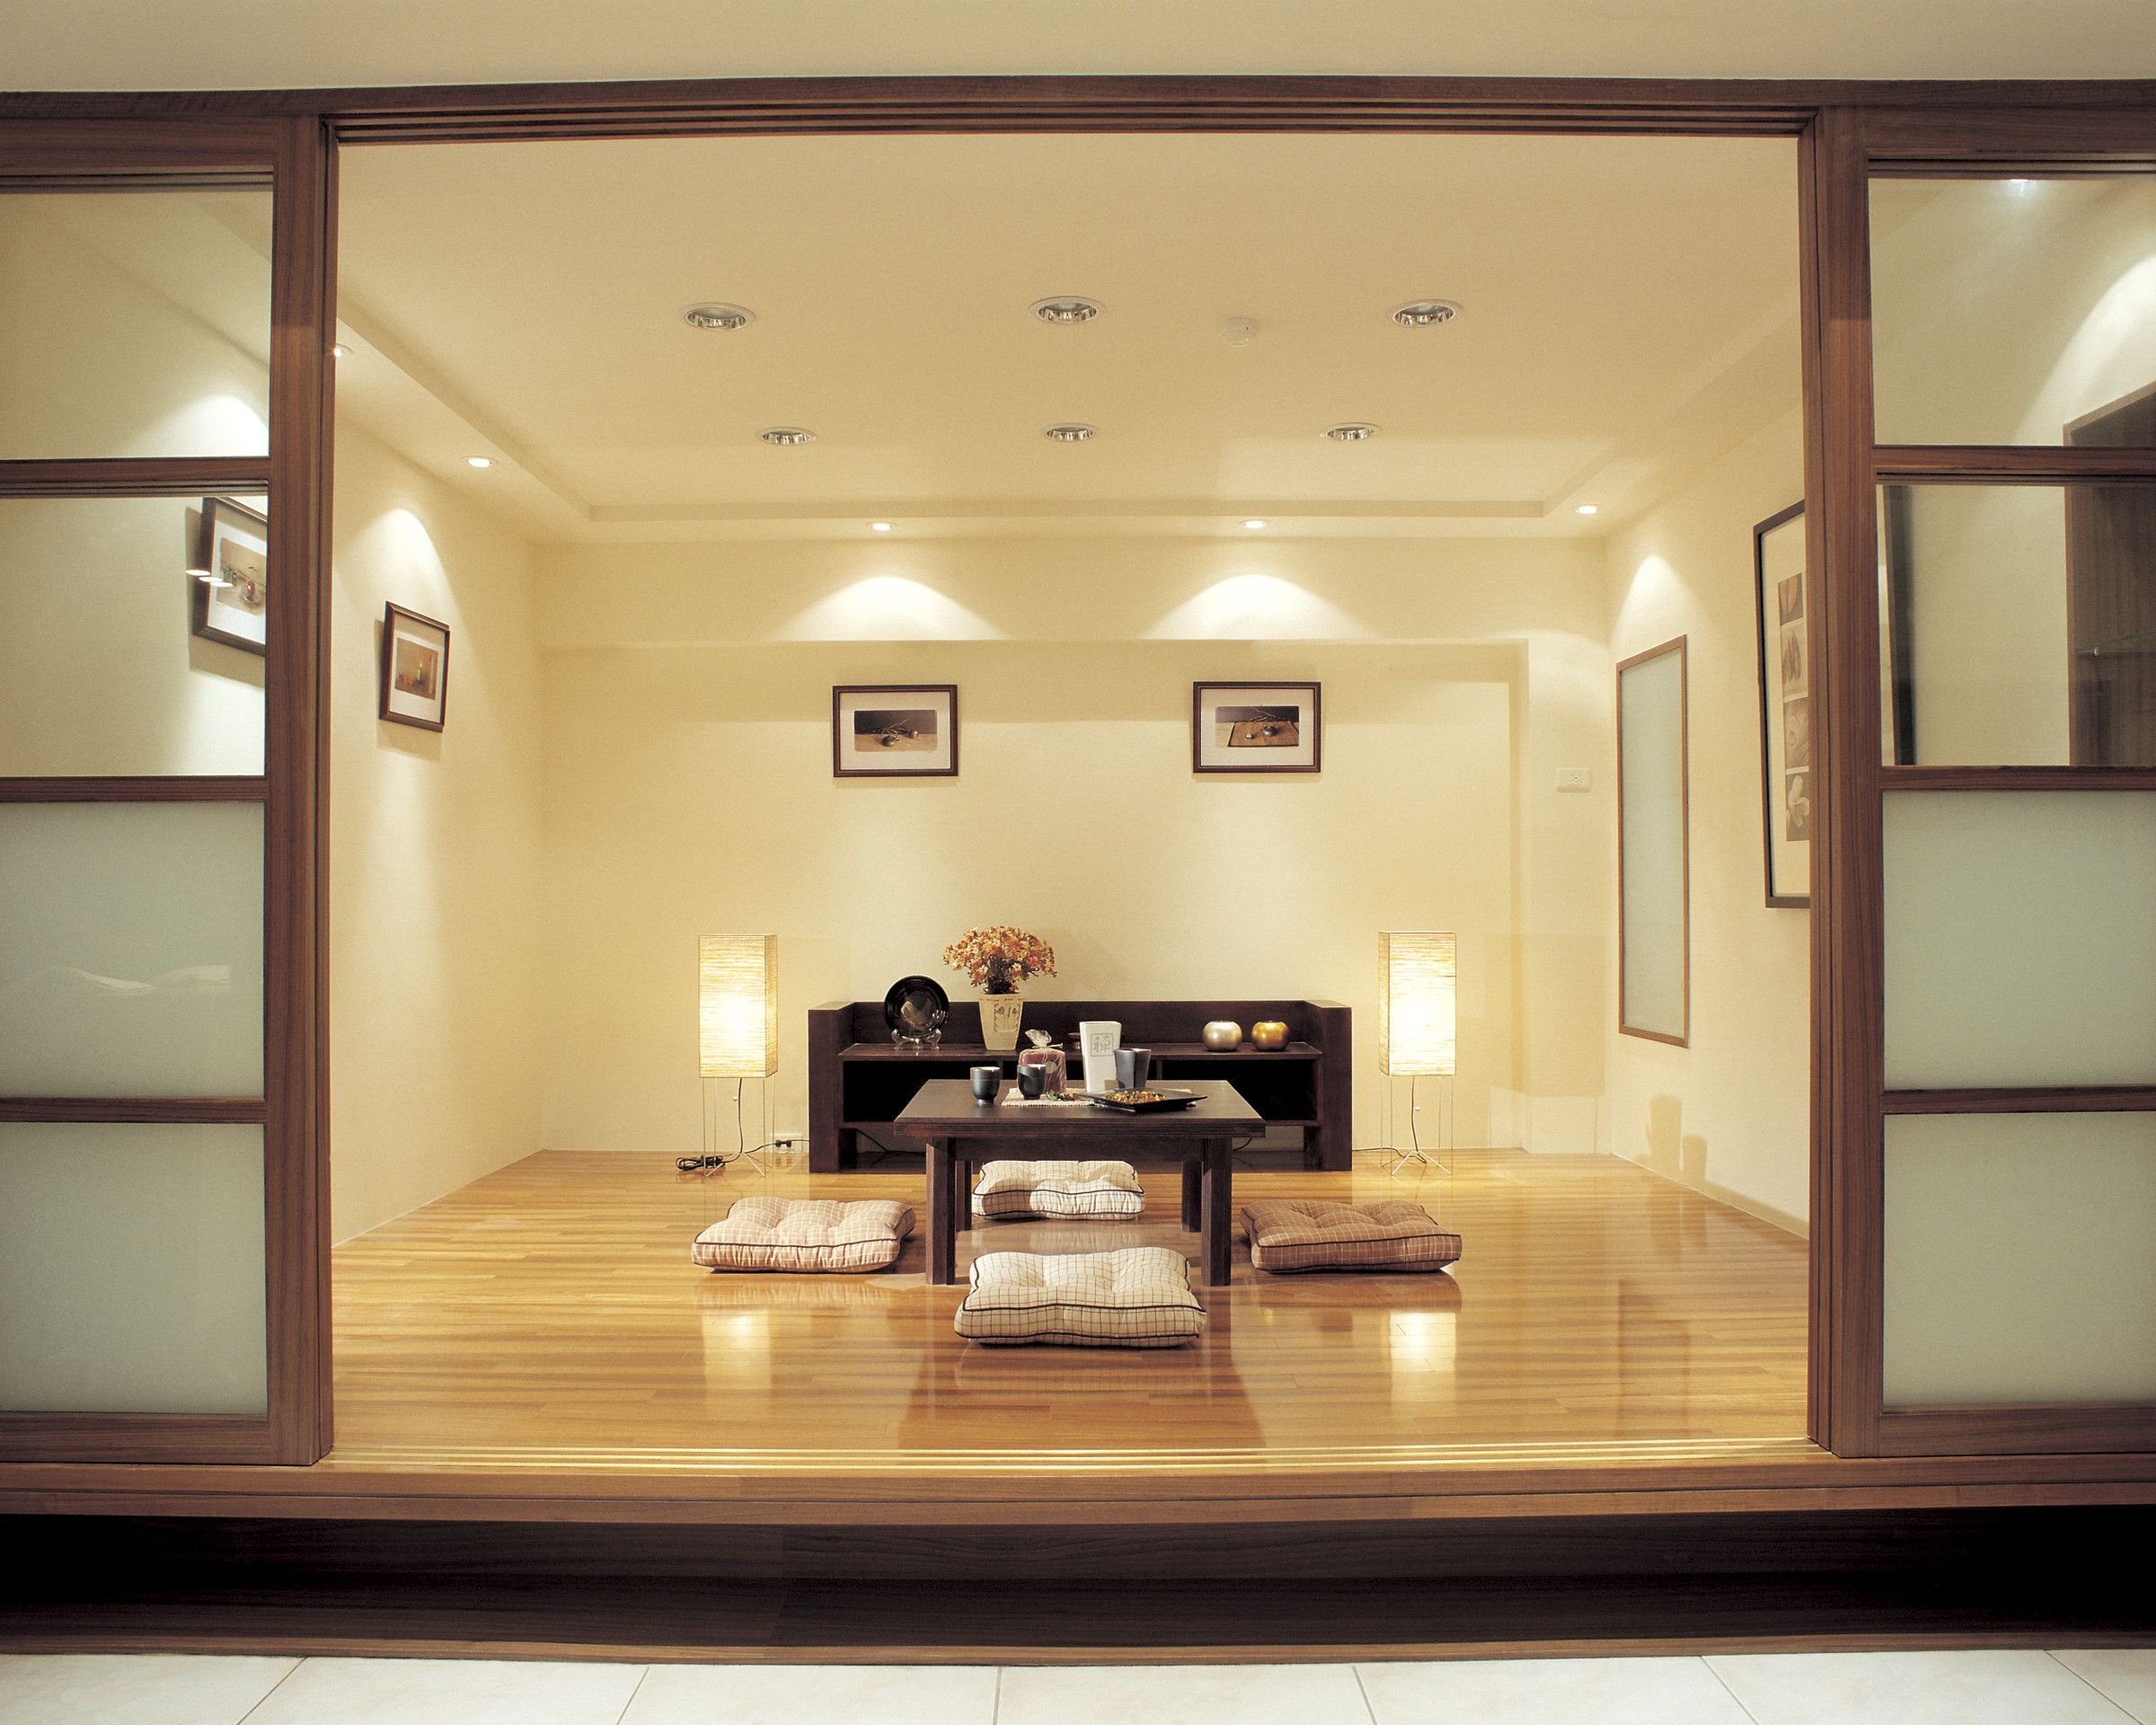 Innenarchitektur · modern japanese interior design ideas visit www kuraarasbasin net japaneseinteriordesign linteriordesign